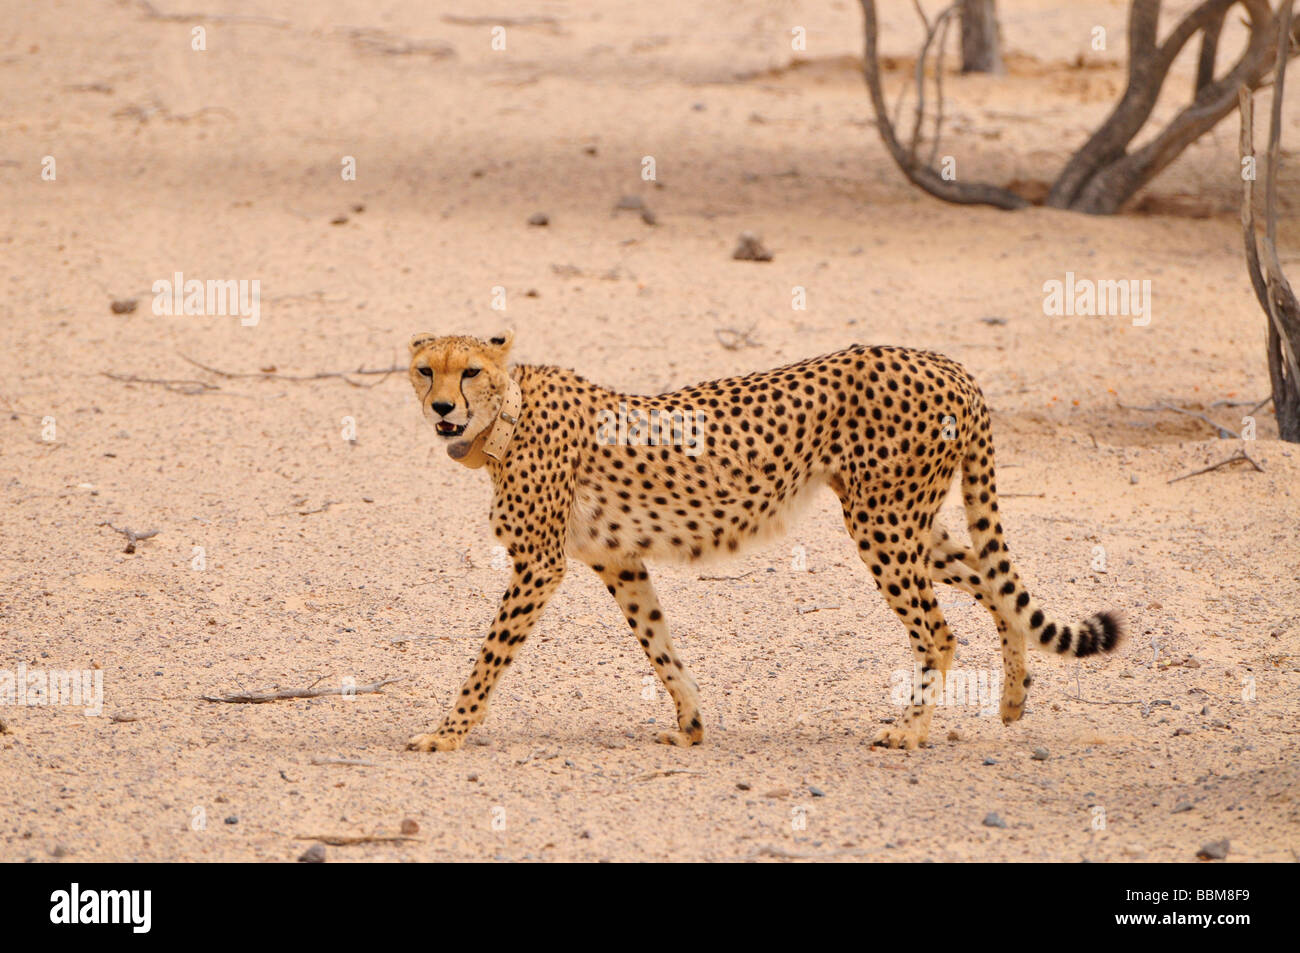 Cheetah (Acinonyx jubatus soemmerringii), in a vivarium, Sir Bani Yas Island, Abu Dhabi, United Arab Emirates, Arabia, - Stock Image